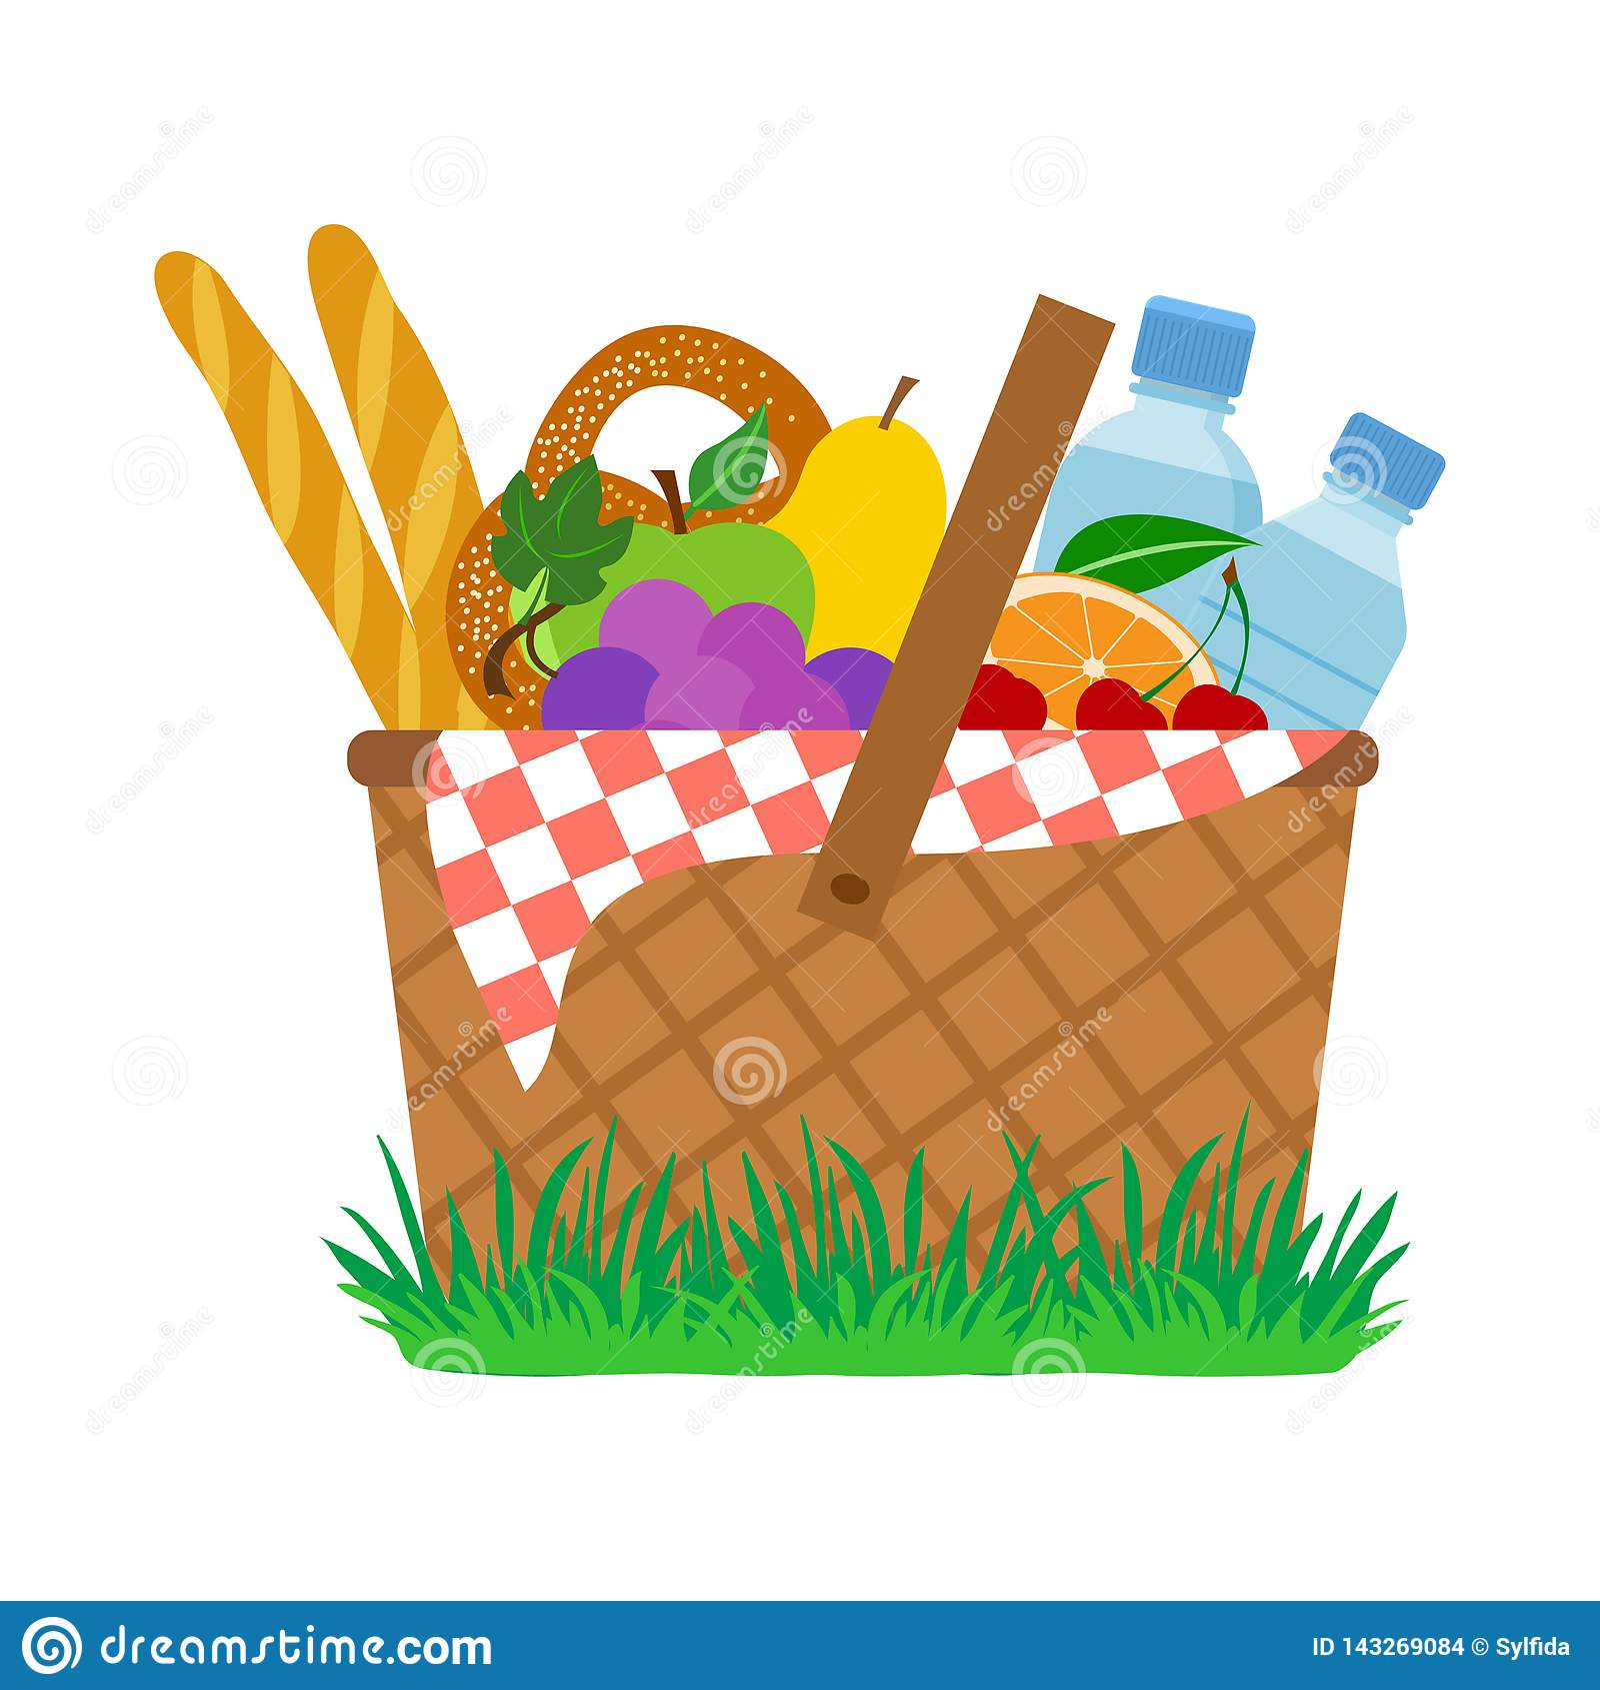 Picnic Basket On Grass Vector Stock Illustration Illustration Of Natural Outdoor 143269084